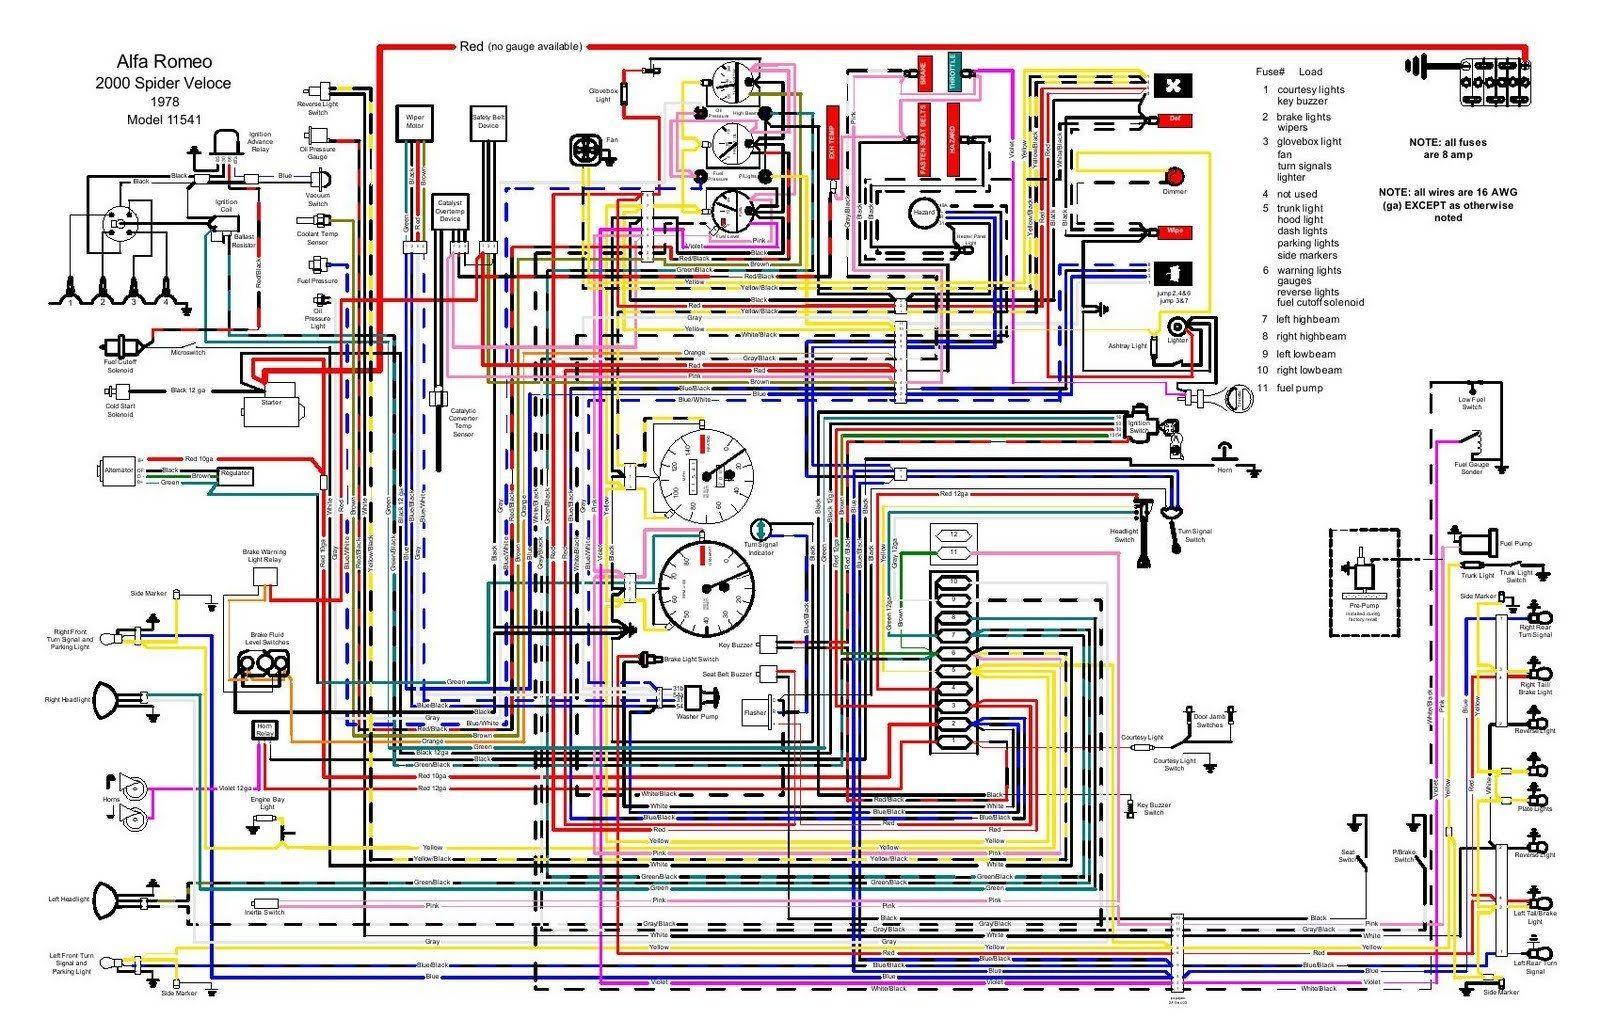 1974 Rolls Royce Wiring Diagram - 67 Ford Solenoid Wiring Diagram -  1990-300zx.citroen-wirings.jeanjaures37.frWiring Diagram Resource